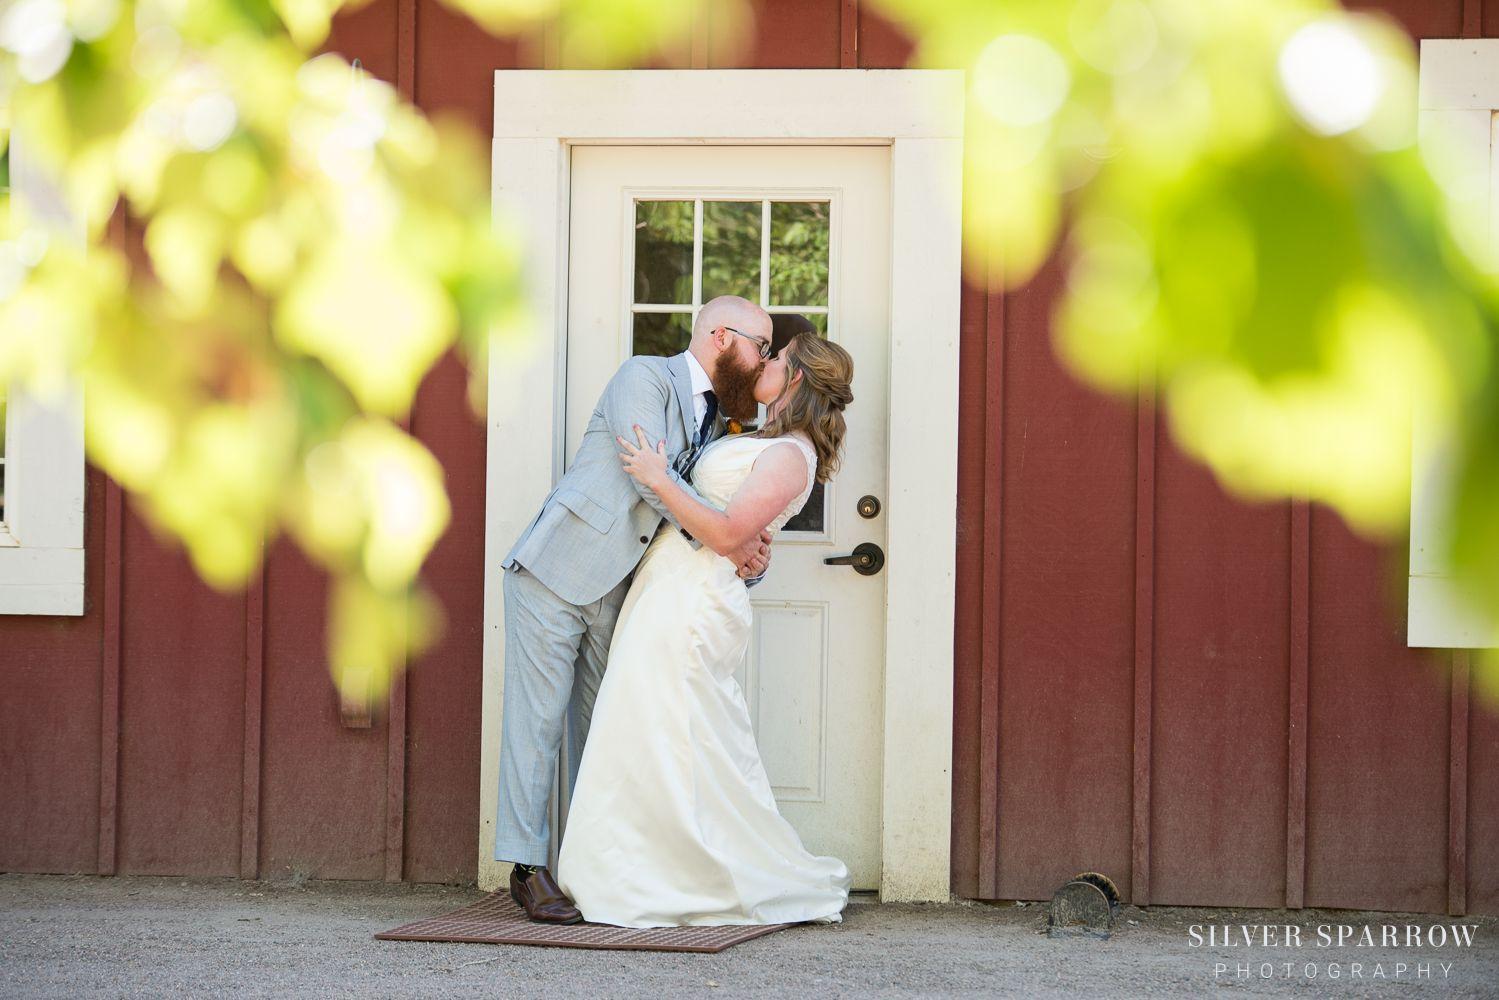 Just had to share another photo from Kevin and Elizabeth's Hudson Gardens wedding earlier this month. They are the sweetest!!   www.silversparrowphoto.com  #LittletonWeddingPhotographer #wedding #weddinginspiration #barnwedding #denverwedding #coloradowedding